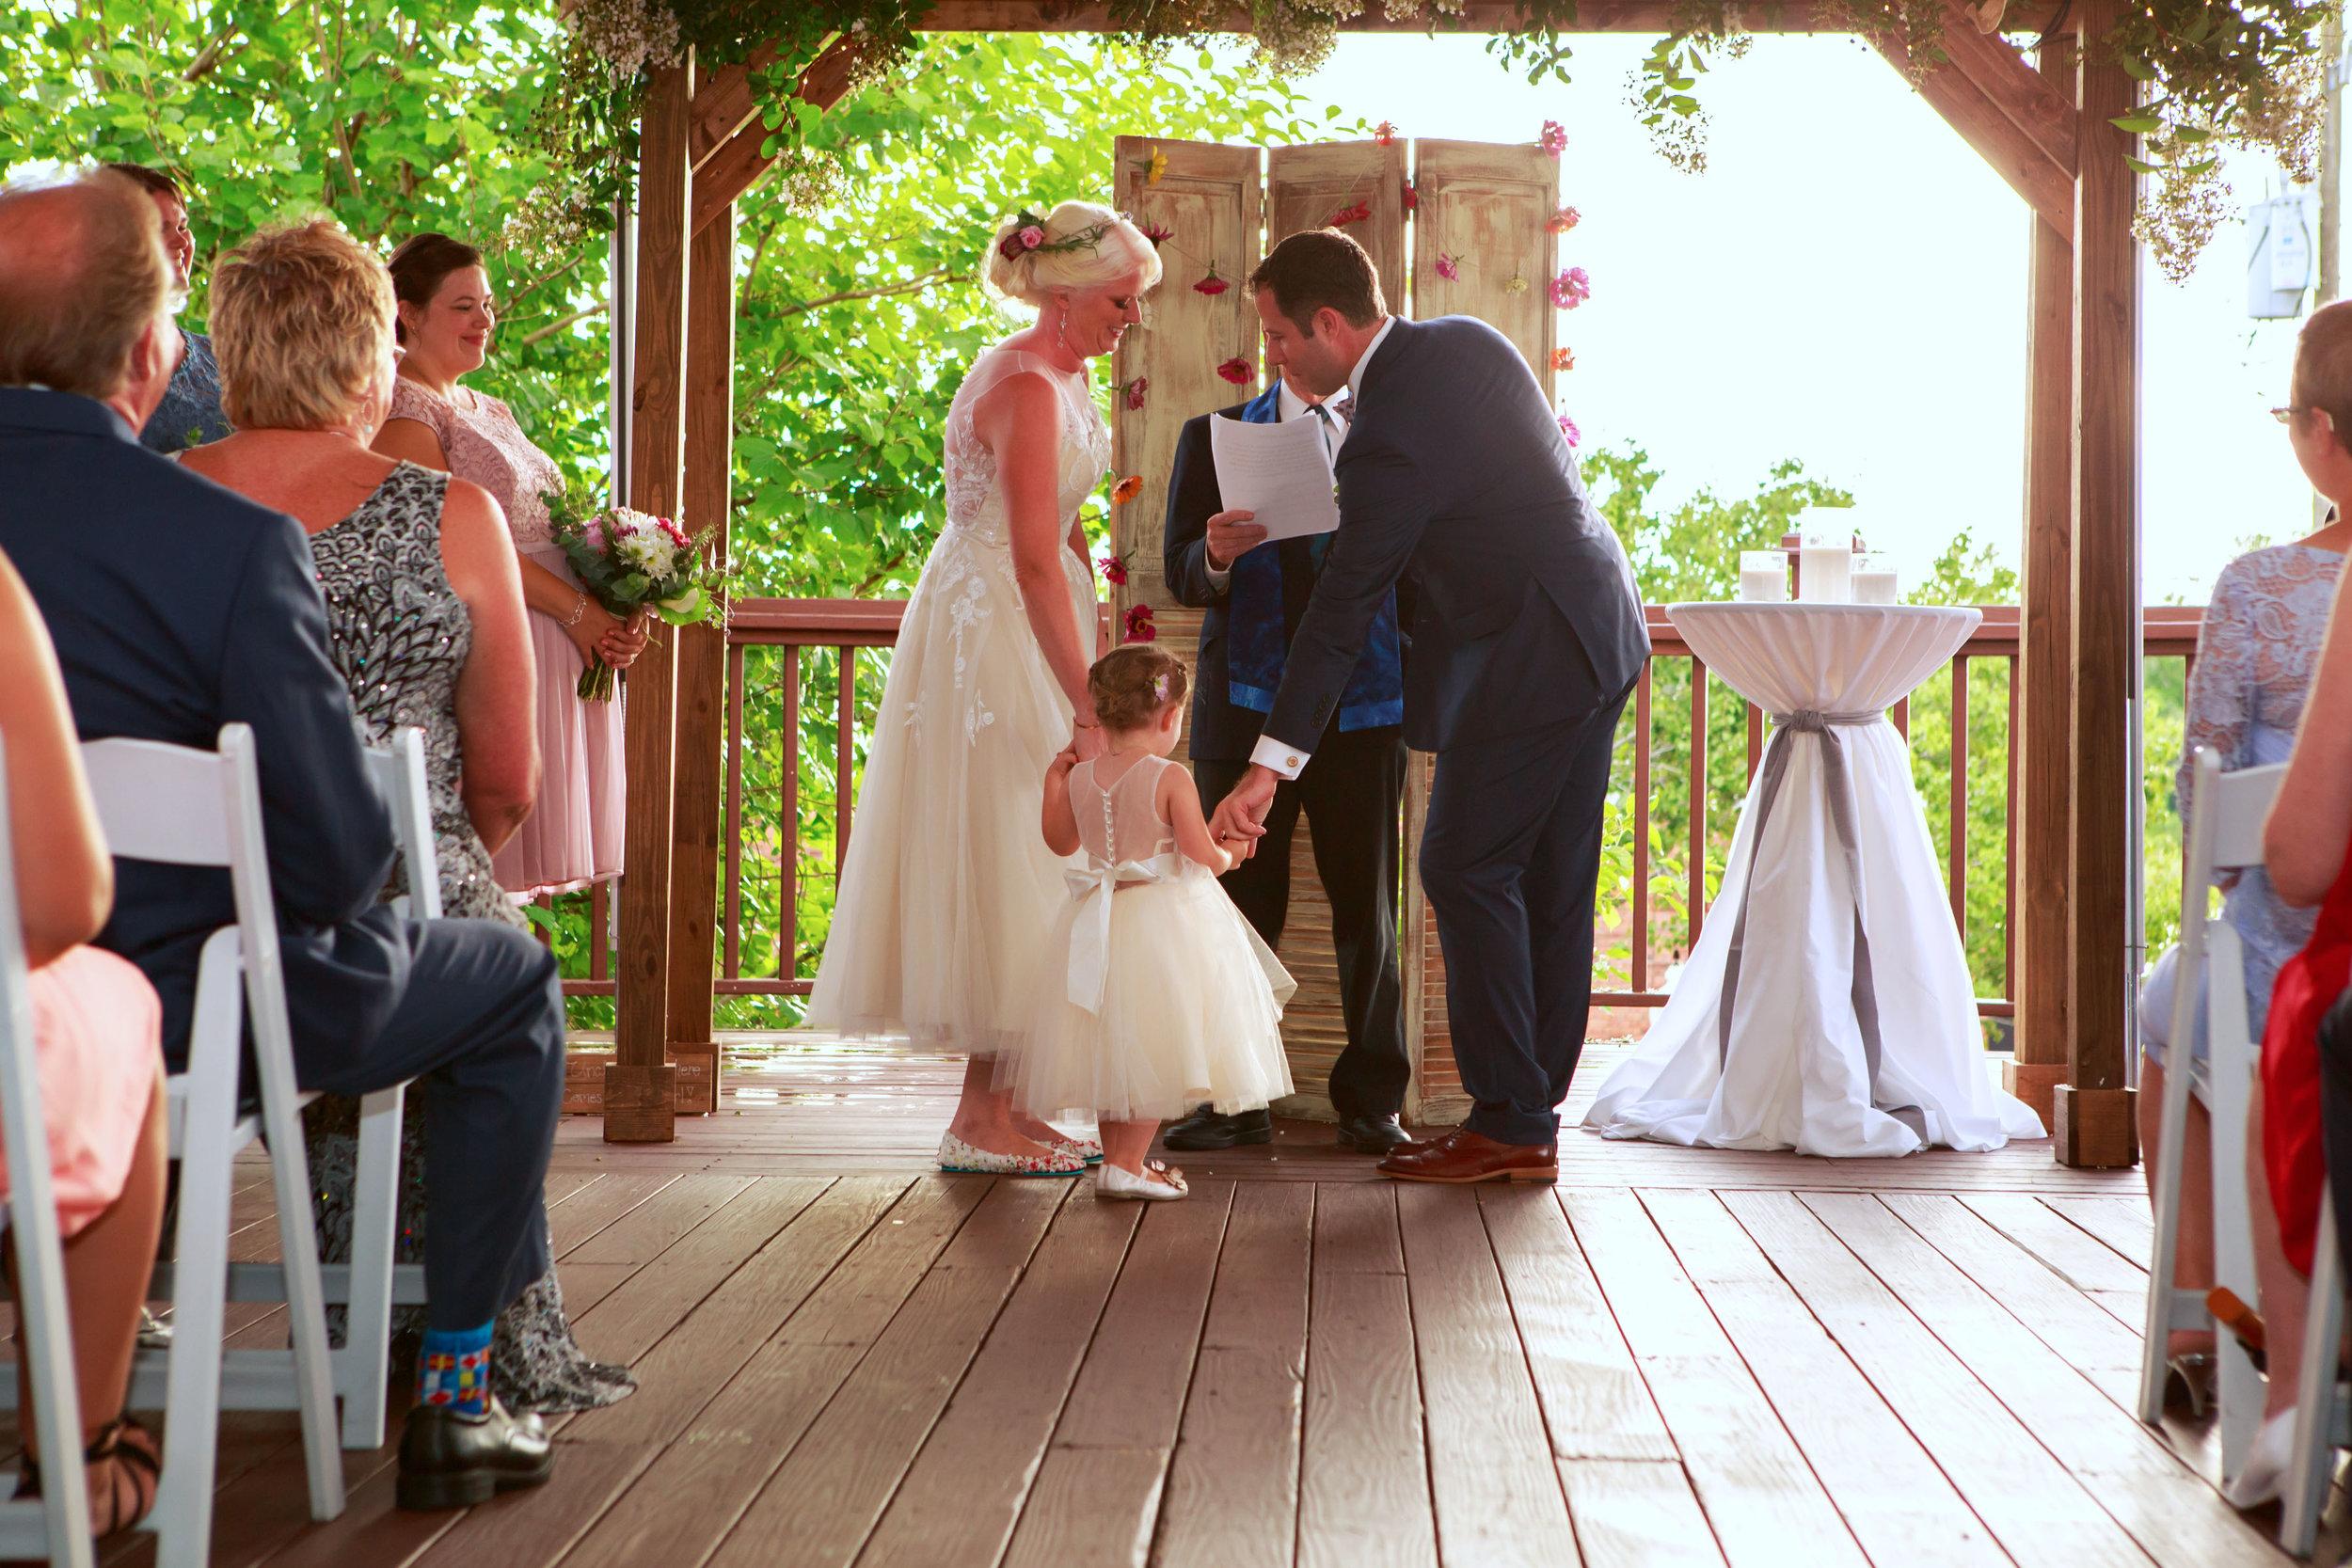 128-South-Wedding-Wilmington-NC-Photographer-Ceremony-16.7.jpg